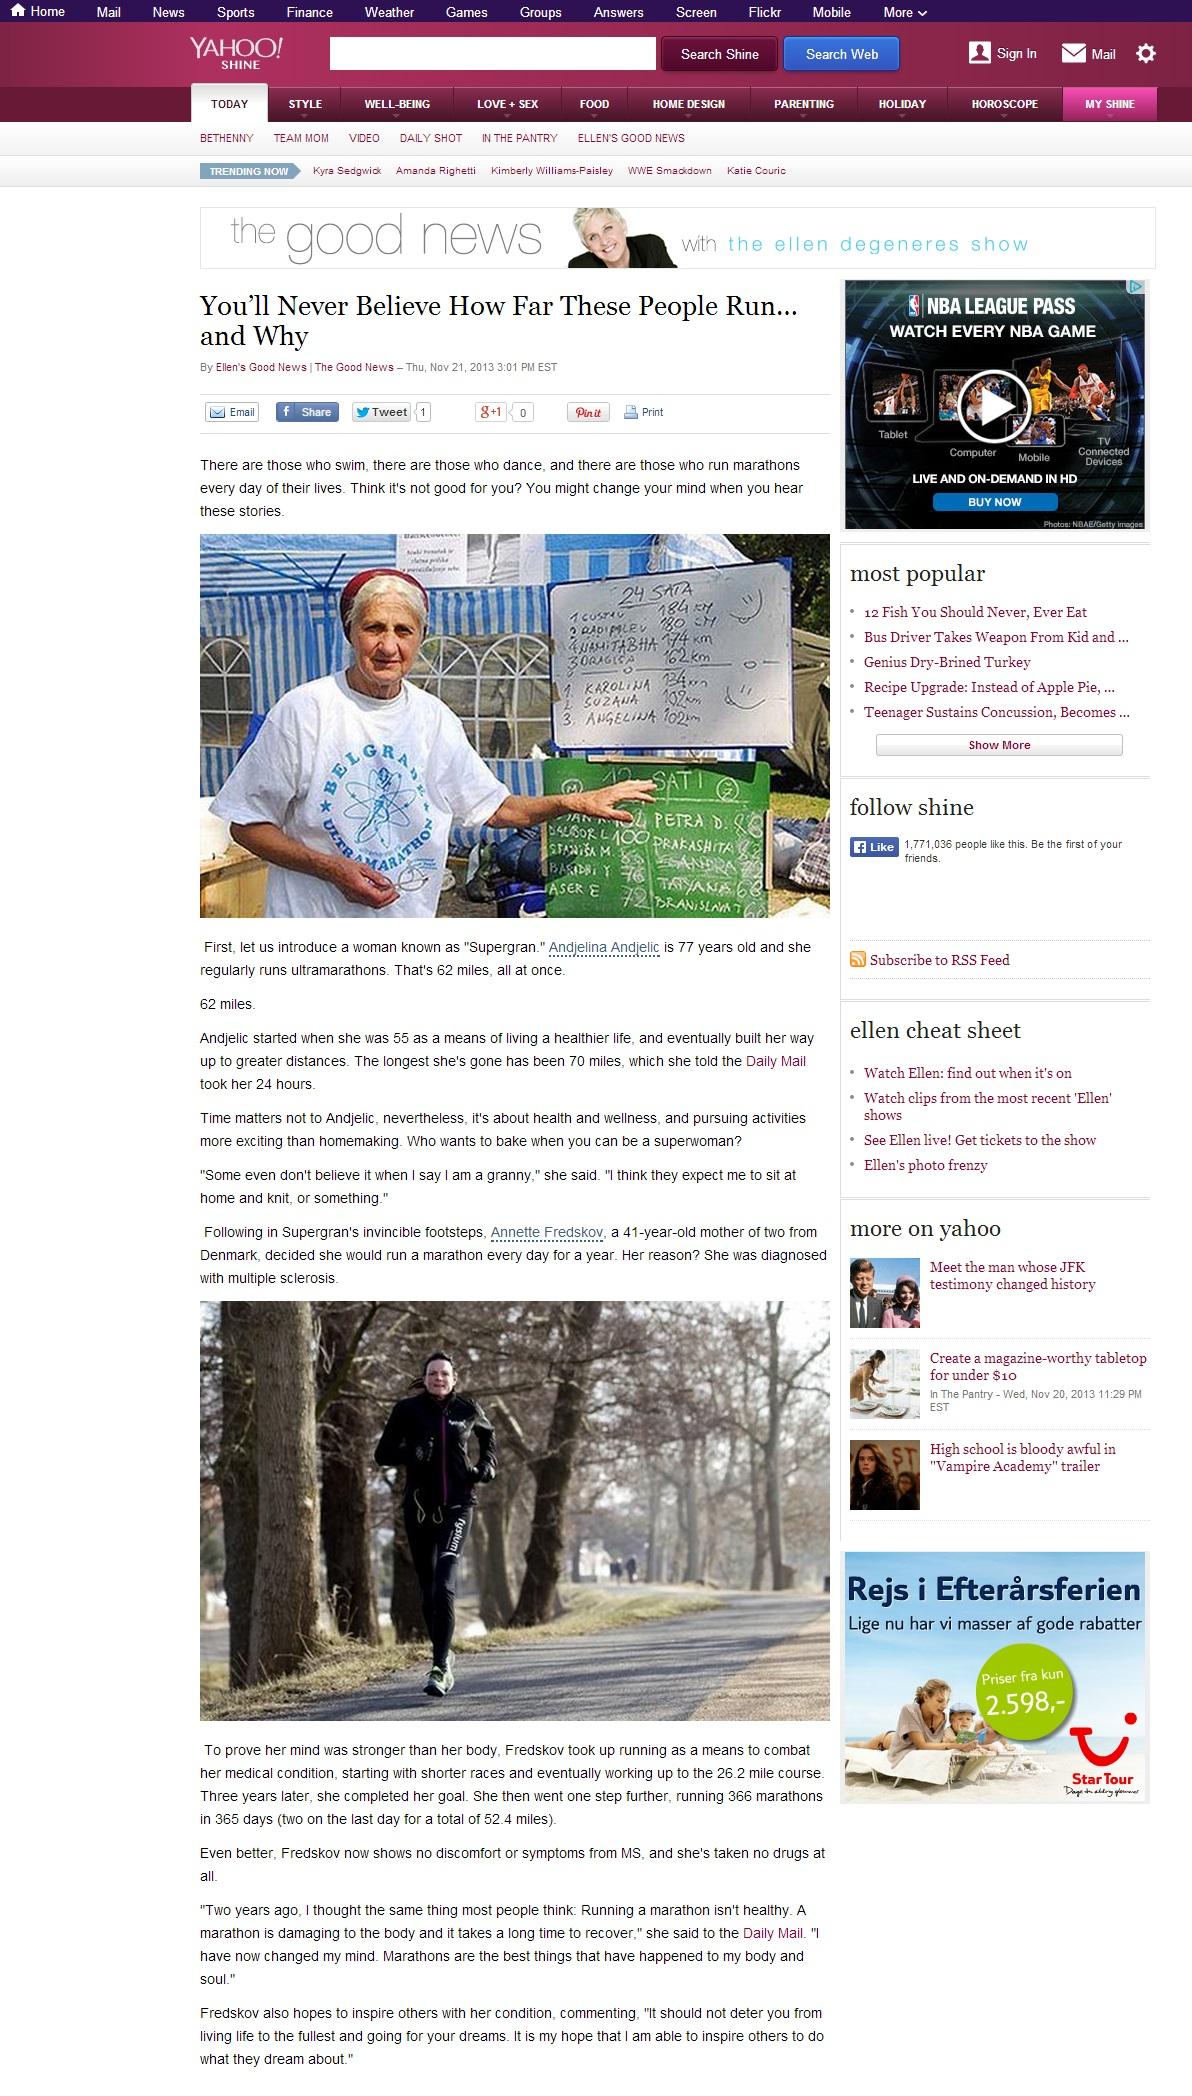 shine.yahoo.com 2013.11.21